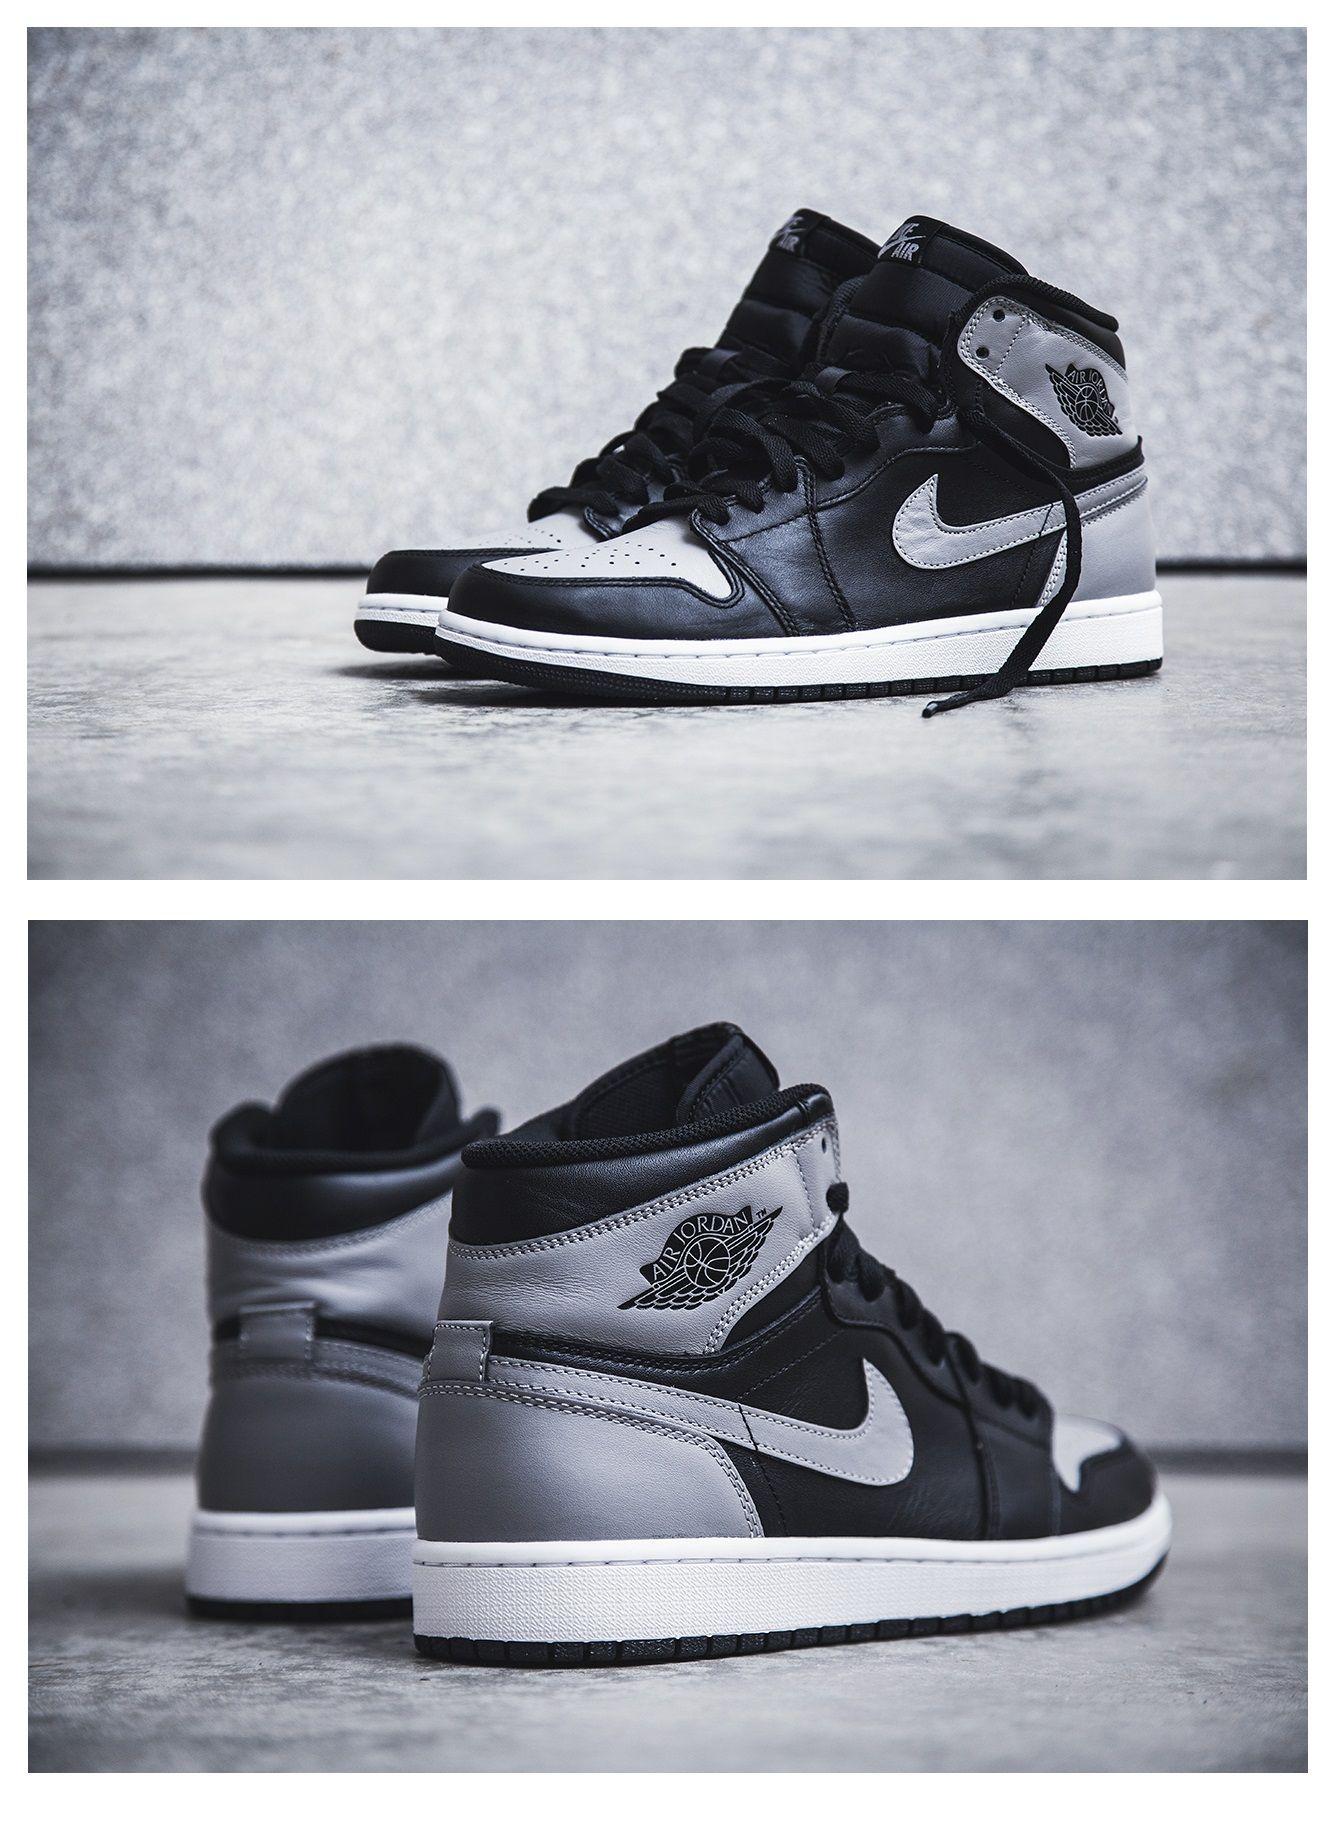 Nike Air masculinos Jordan Style Pinterest Tênis Tênis masculinos Air e e417d6